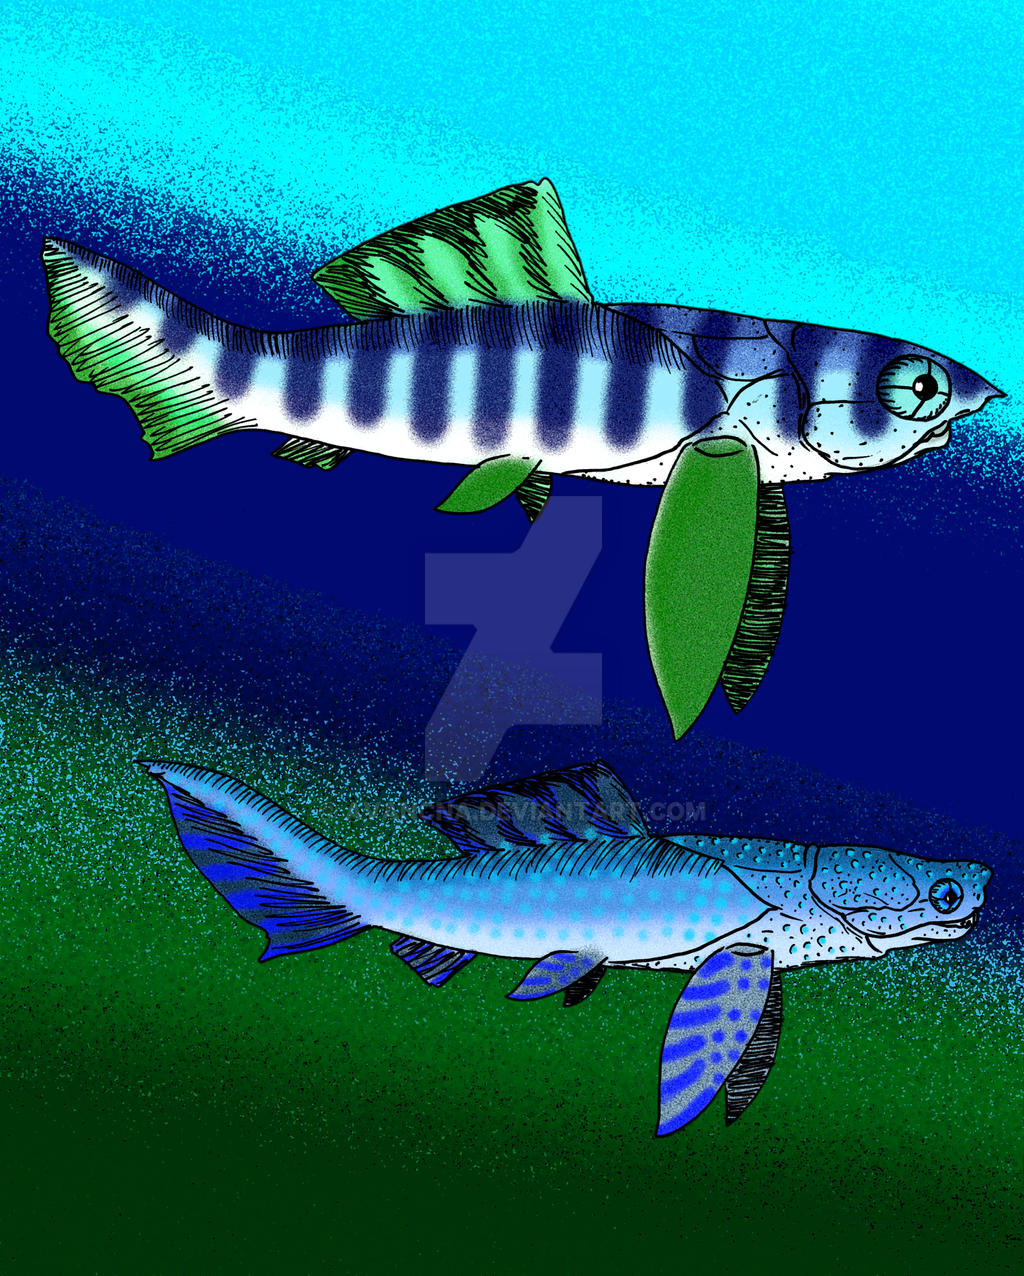 Camuropiscidae 02 by avancna